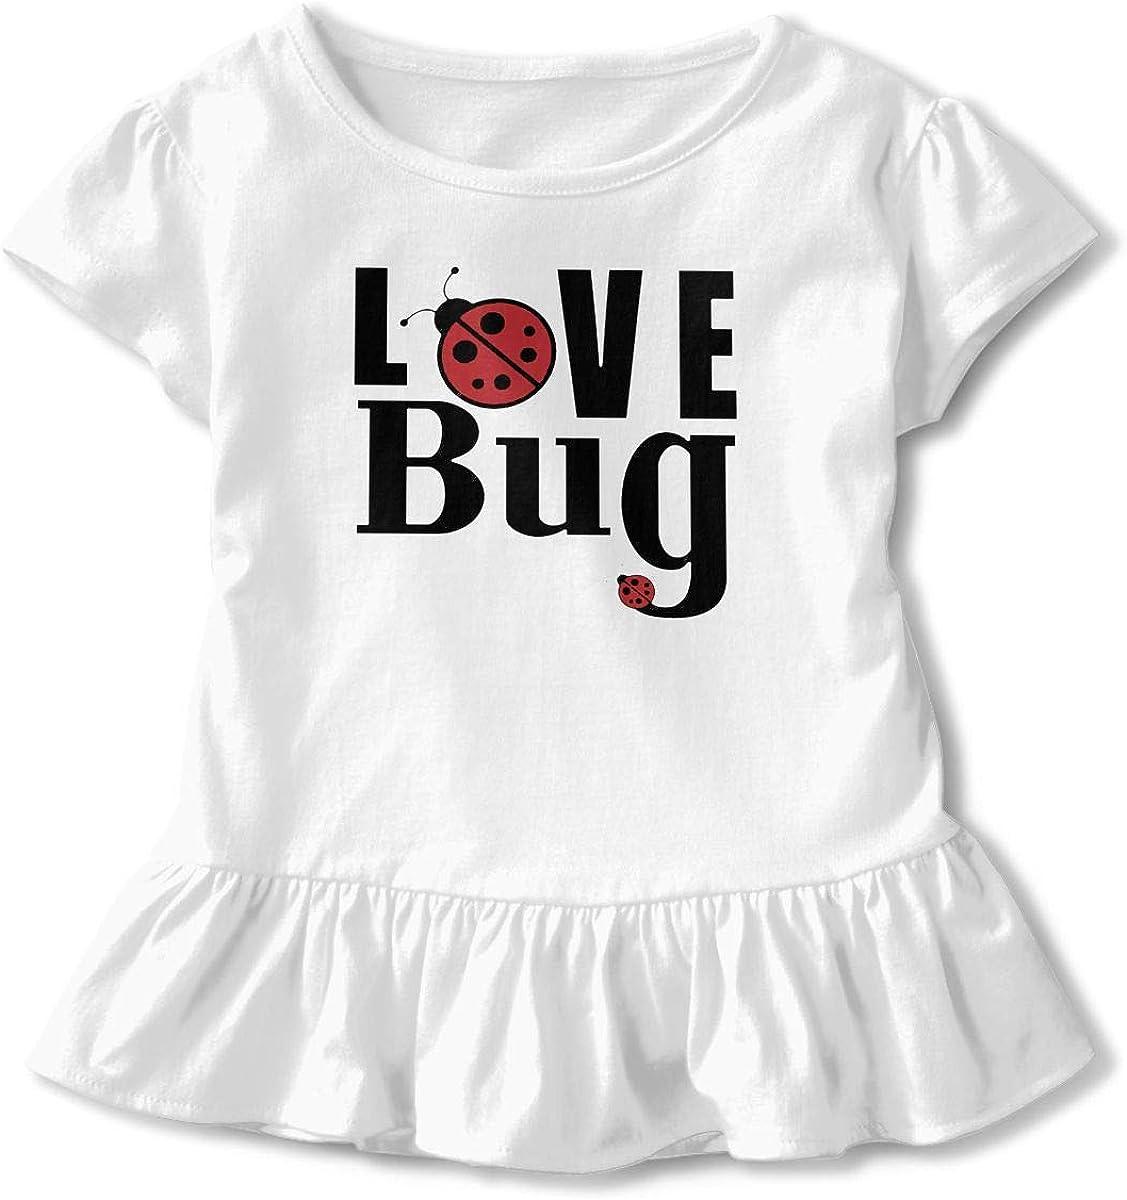 Love Ladybugs Baby Skirts Adorable Kids T Shirt Dress Comfortable Flounces Layette